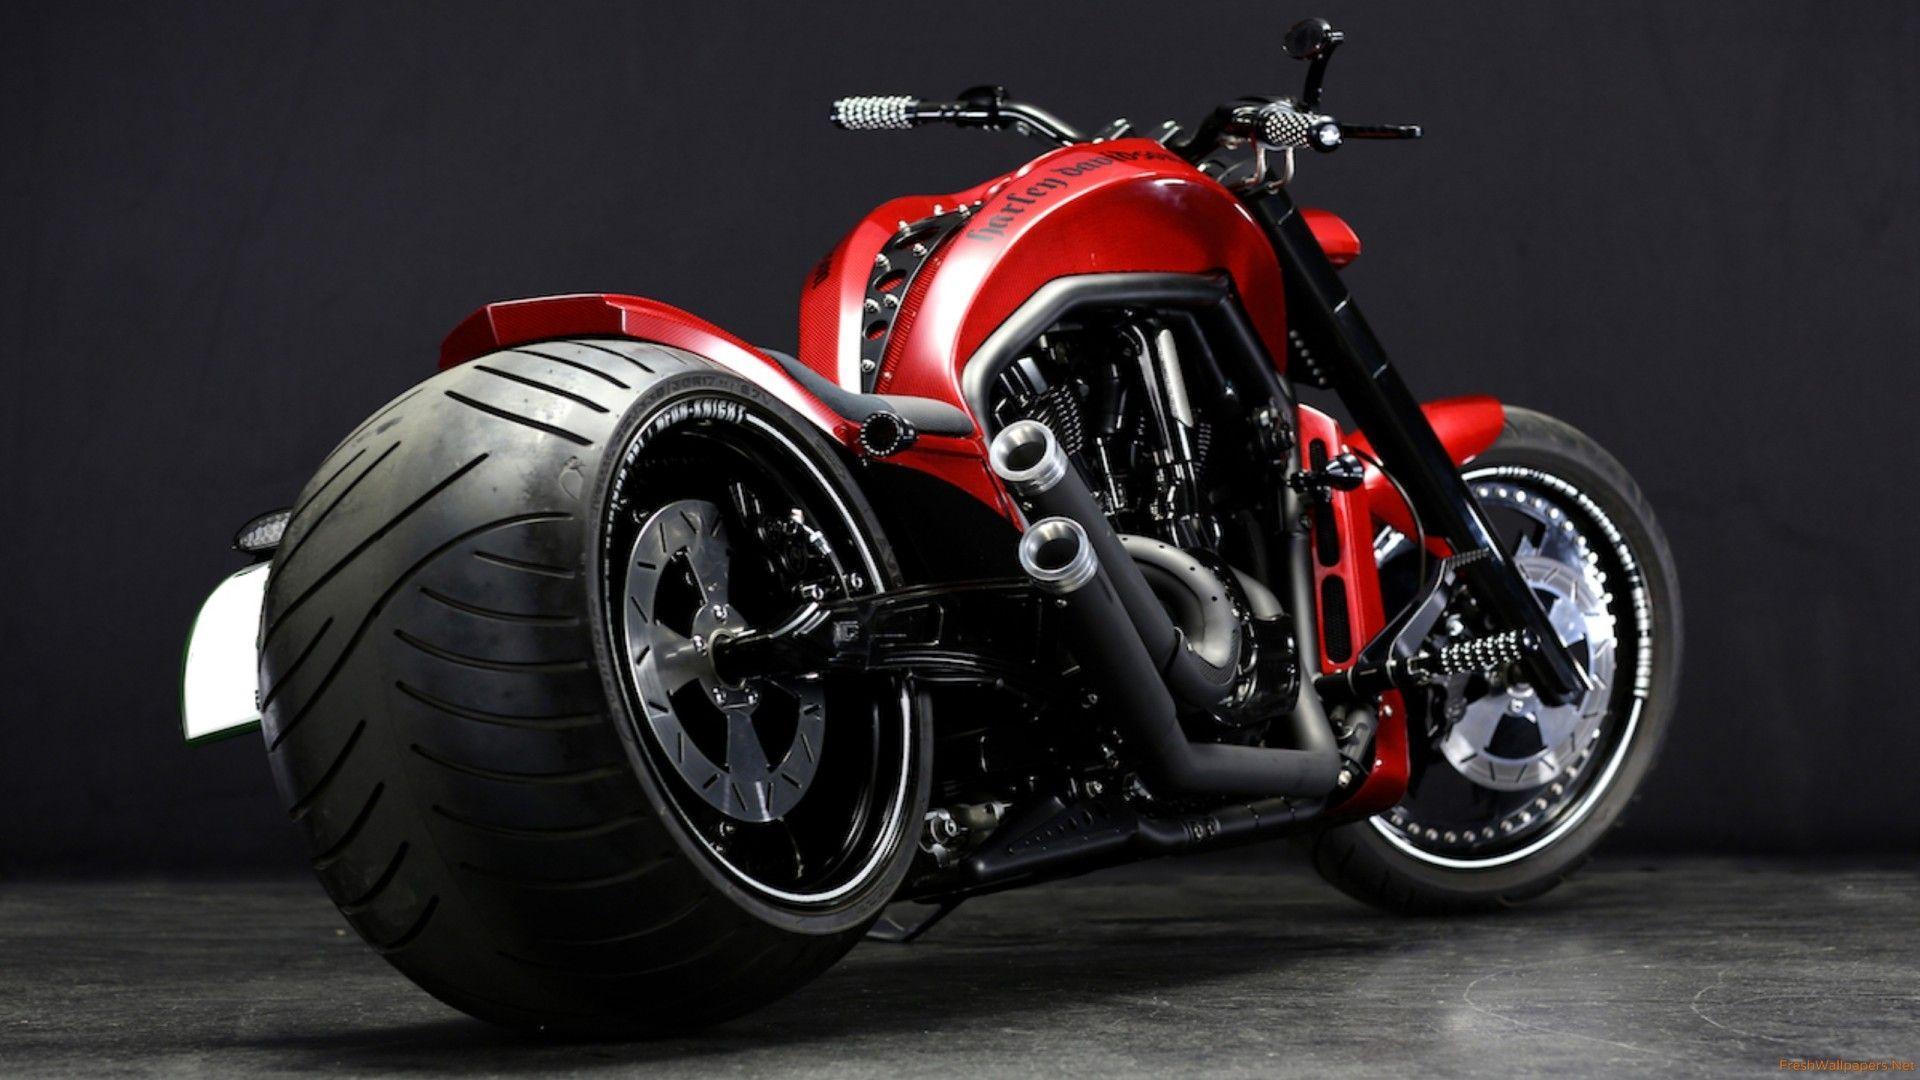 Harley Davidson Wallpapers - Wallpaper Cave